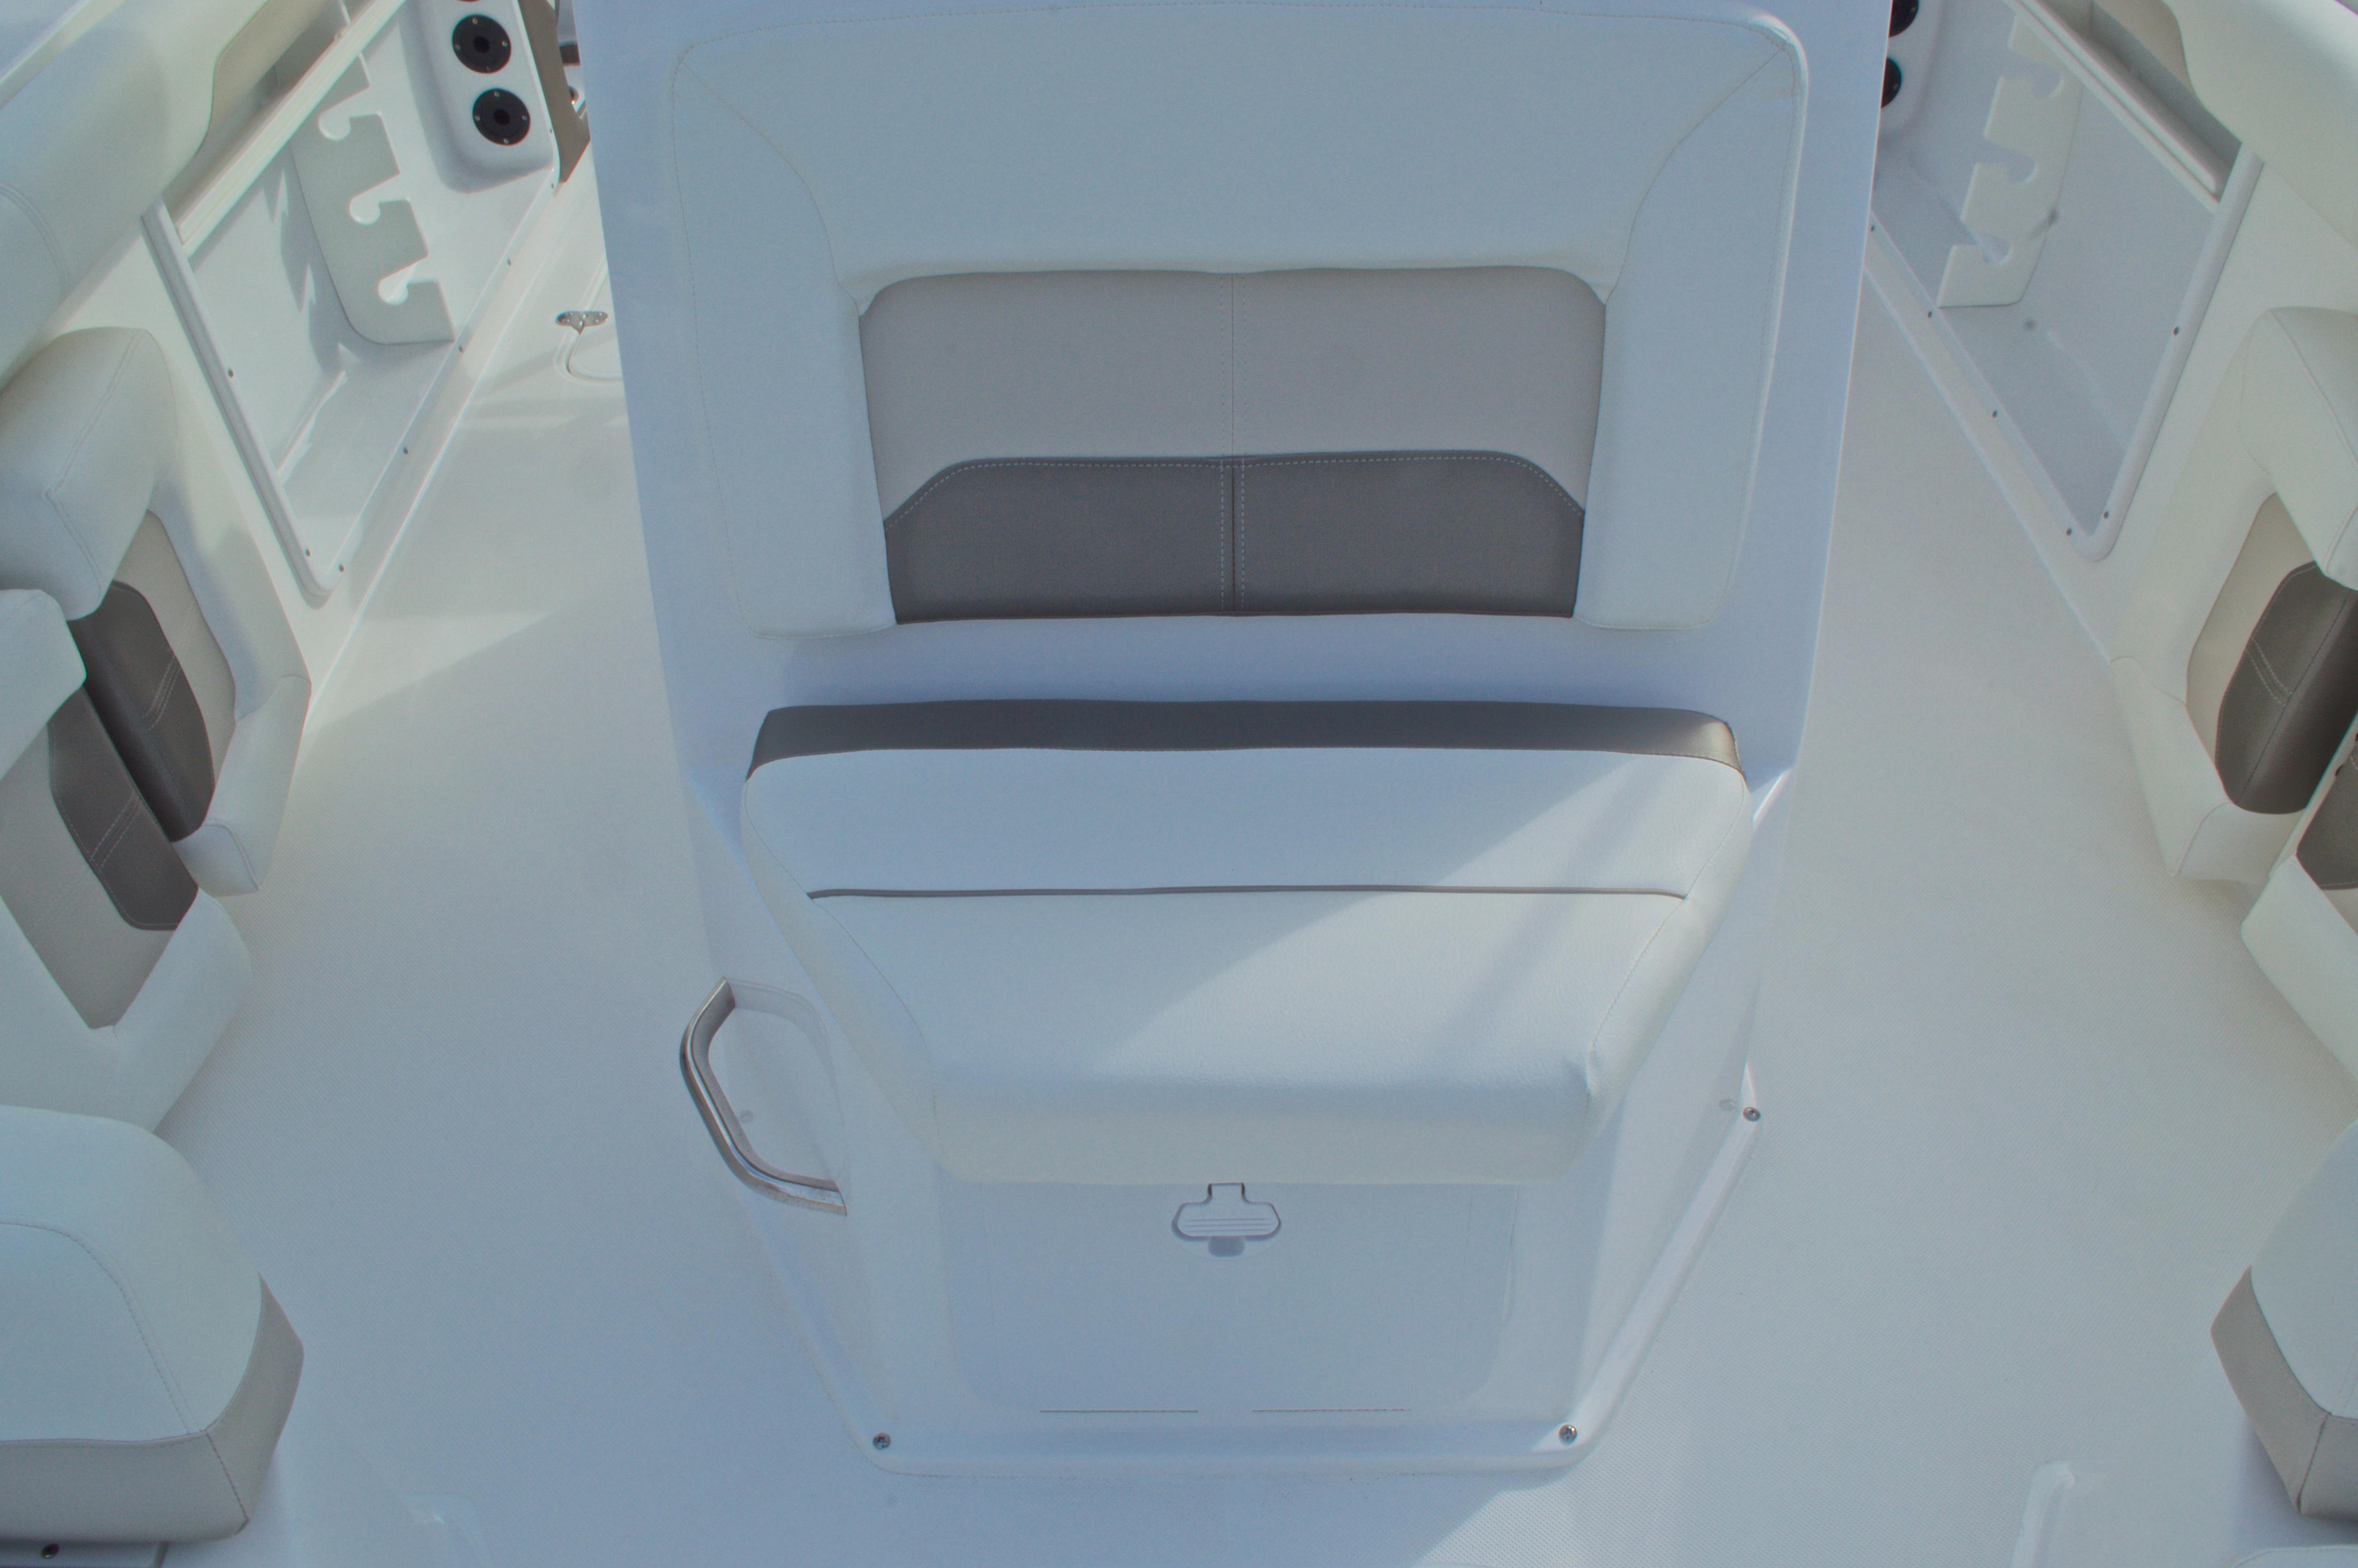 Thumbnail 43 for New 2016 Hurricane CC21 Center Console boat for sale in Vero Beach, FL